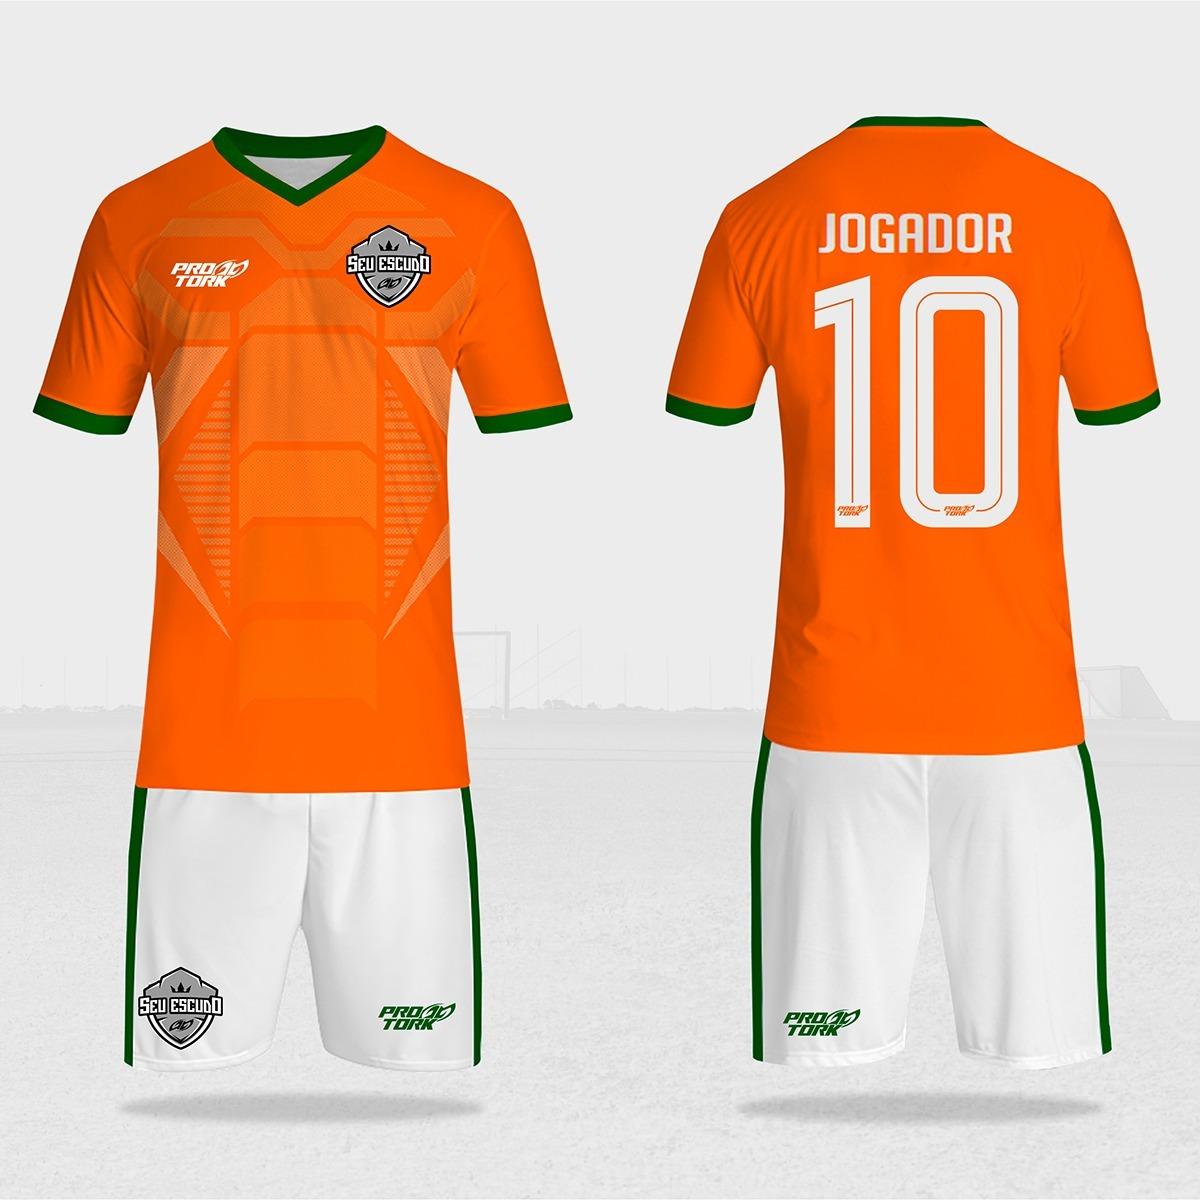 950fbc0b1 ... personalizada futebol ou futsal. Carregando zoom... camisa time futebol.  Carregando zoom.